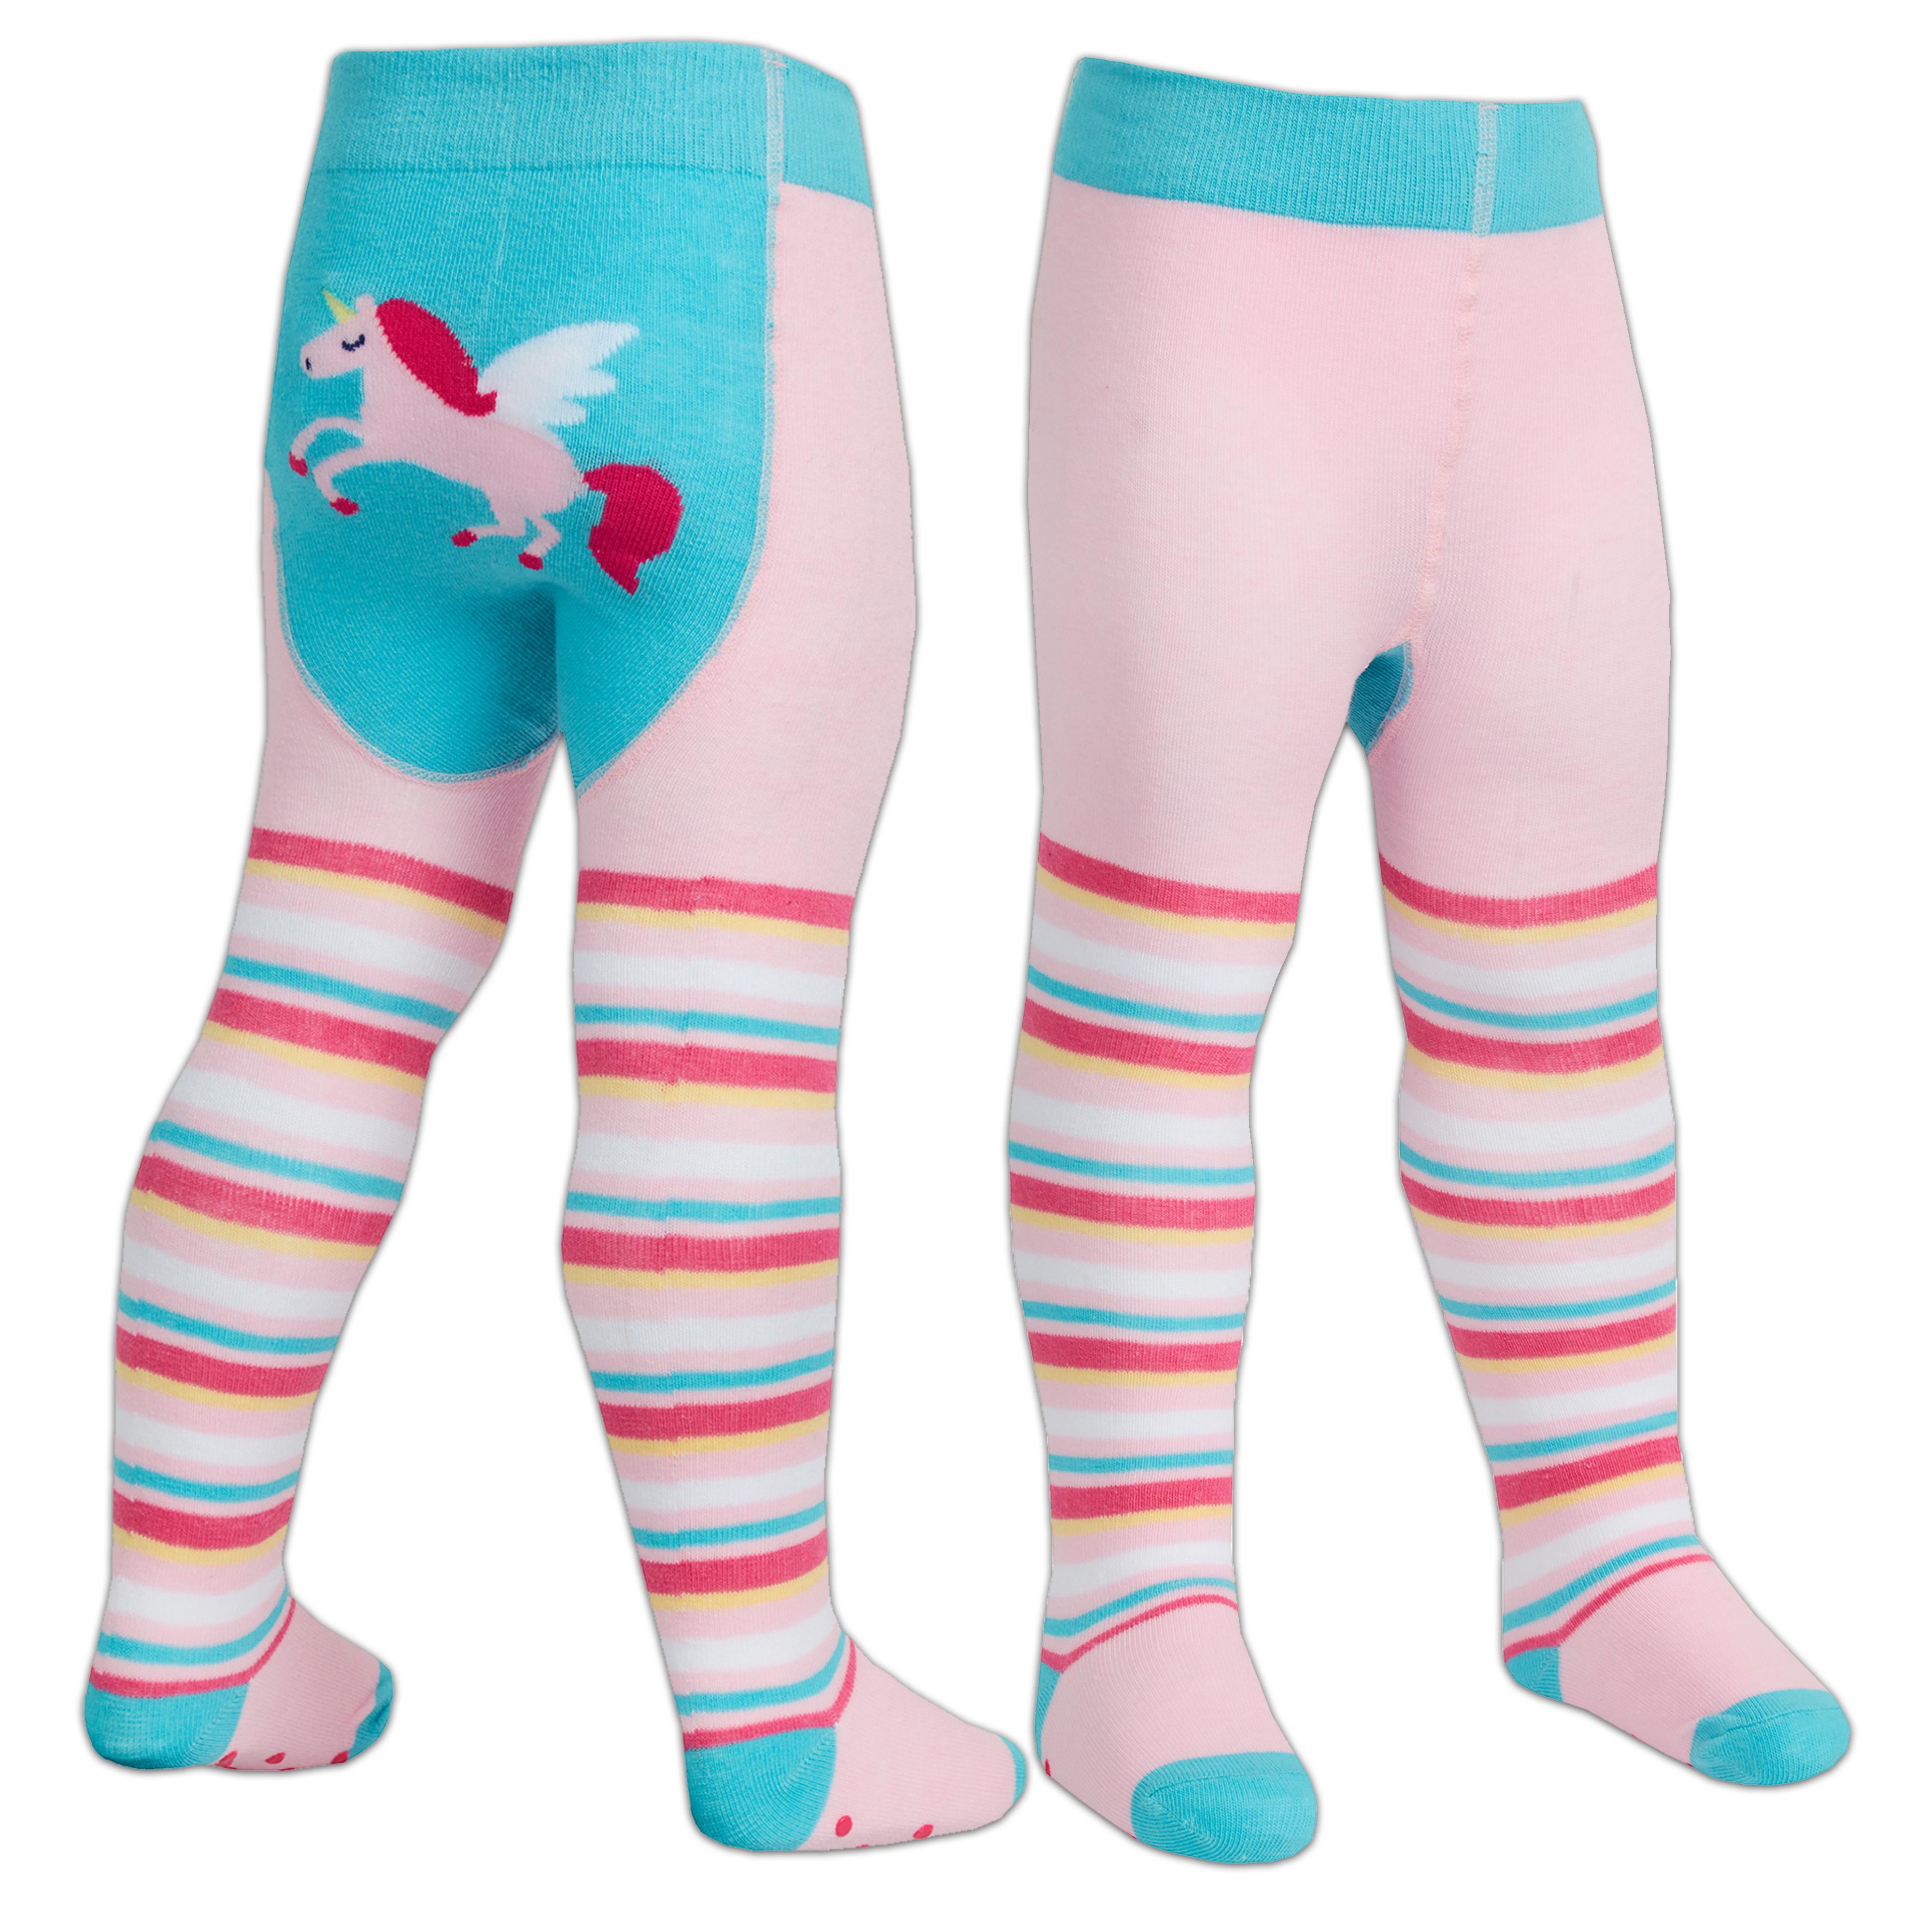 1 or 2 Pairs Baby Girls Tights Cotton Rich Anti Slip Grip Unicorn Ladybird 0-24M